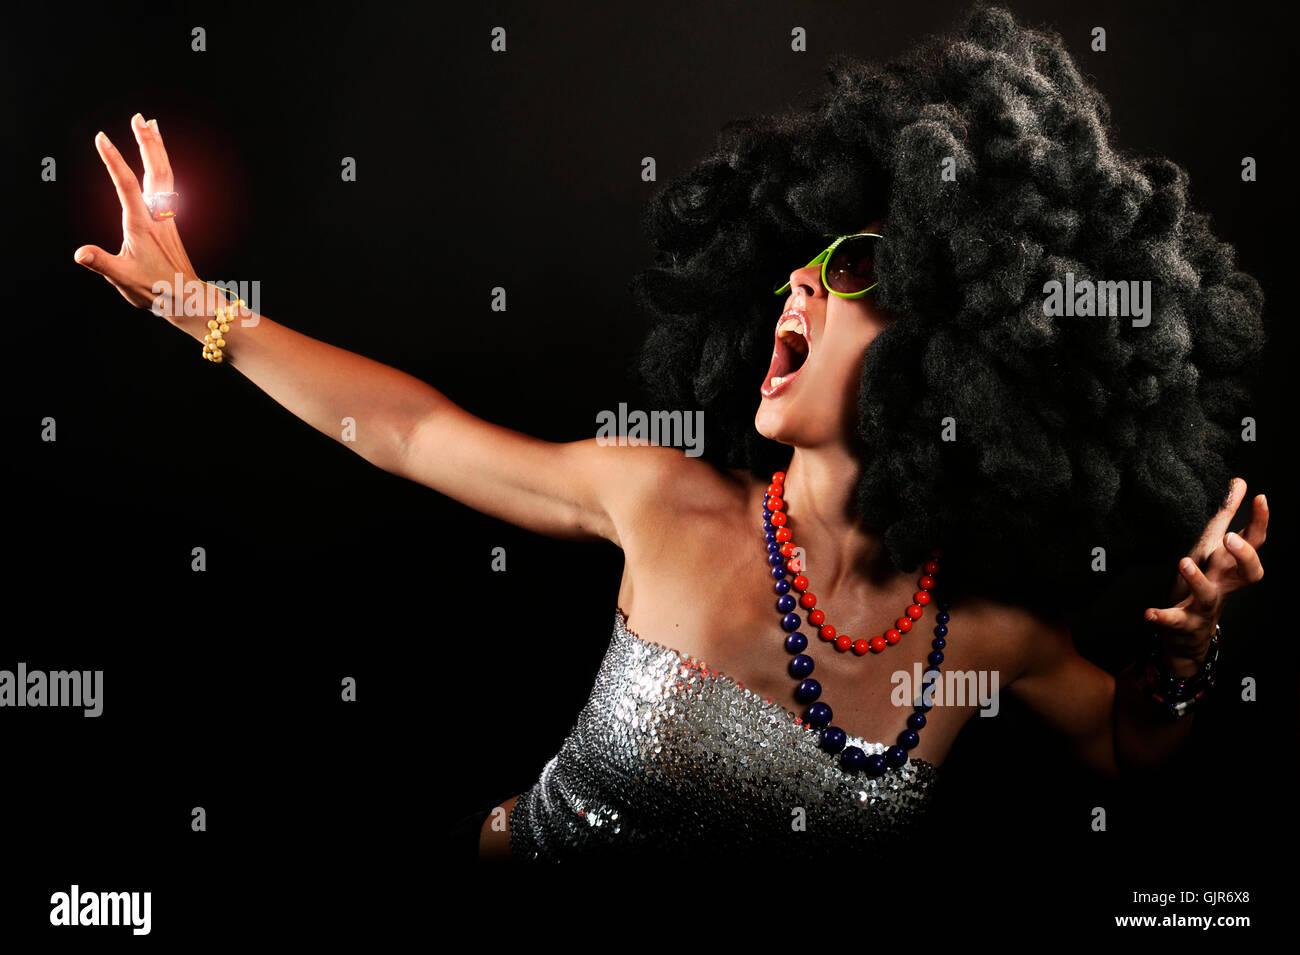 woman disco photo model - Stock Image